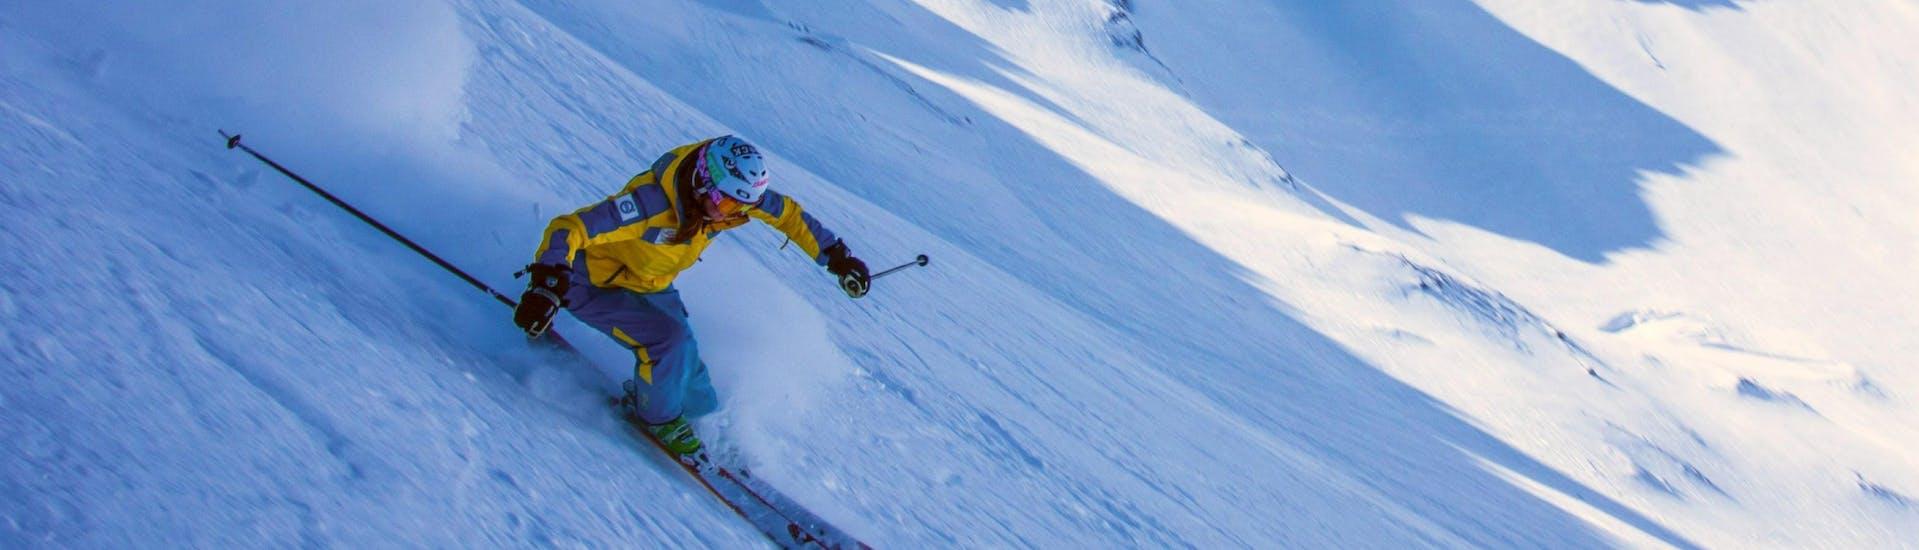 private-adult-ski-lessons-villars-ski-school-hero